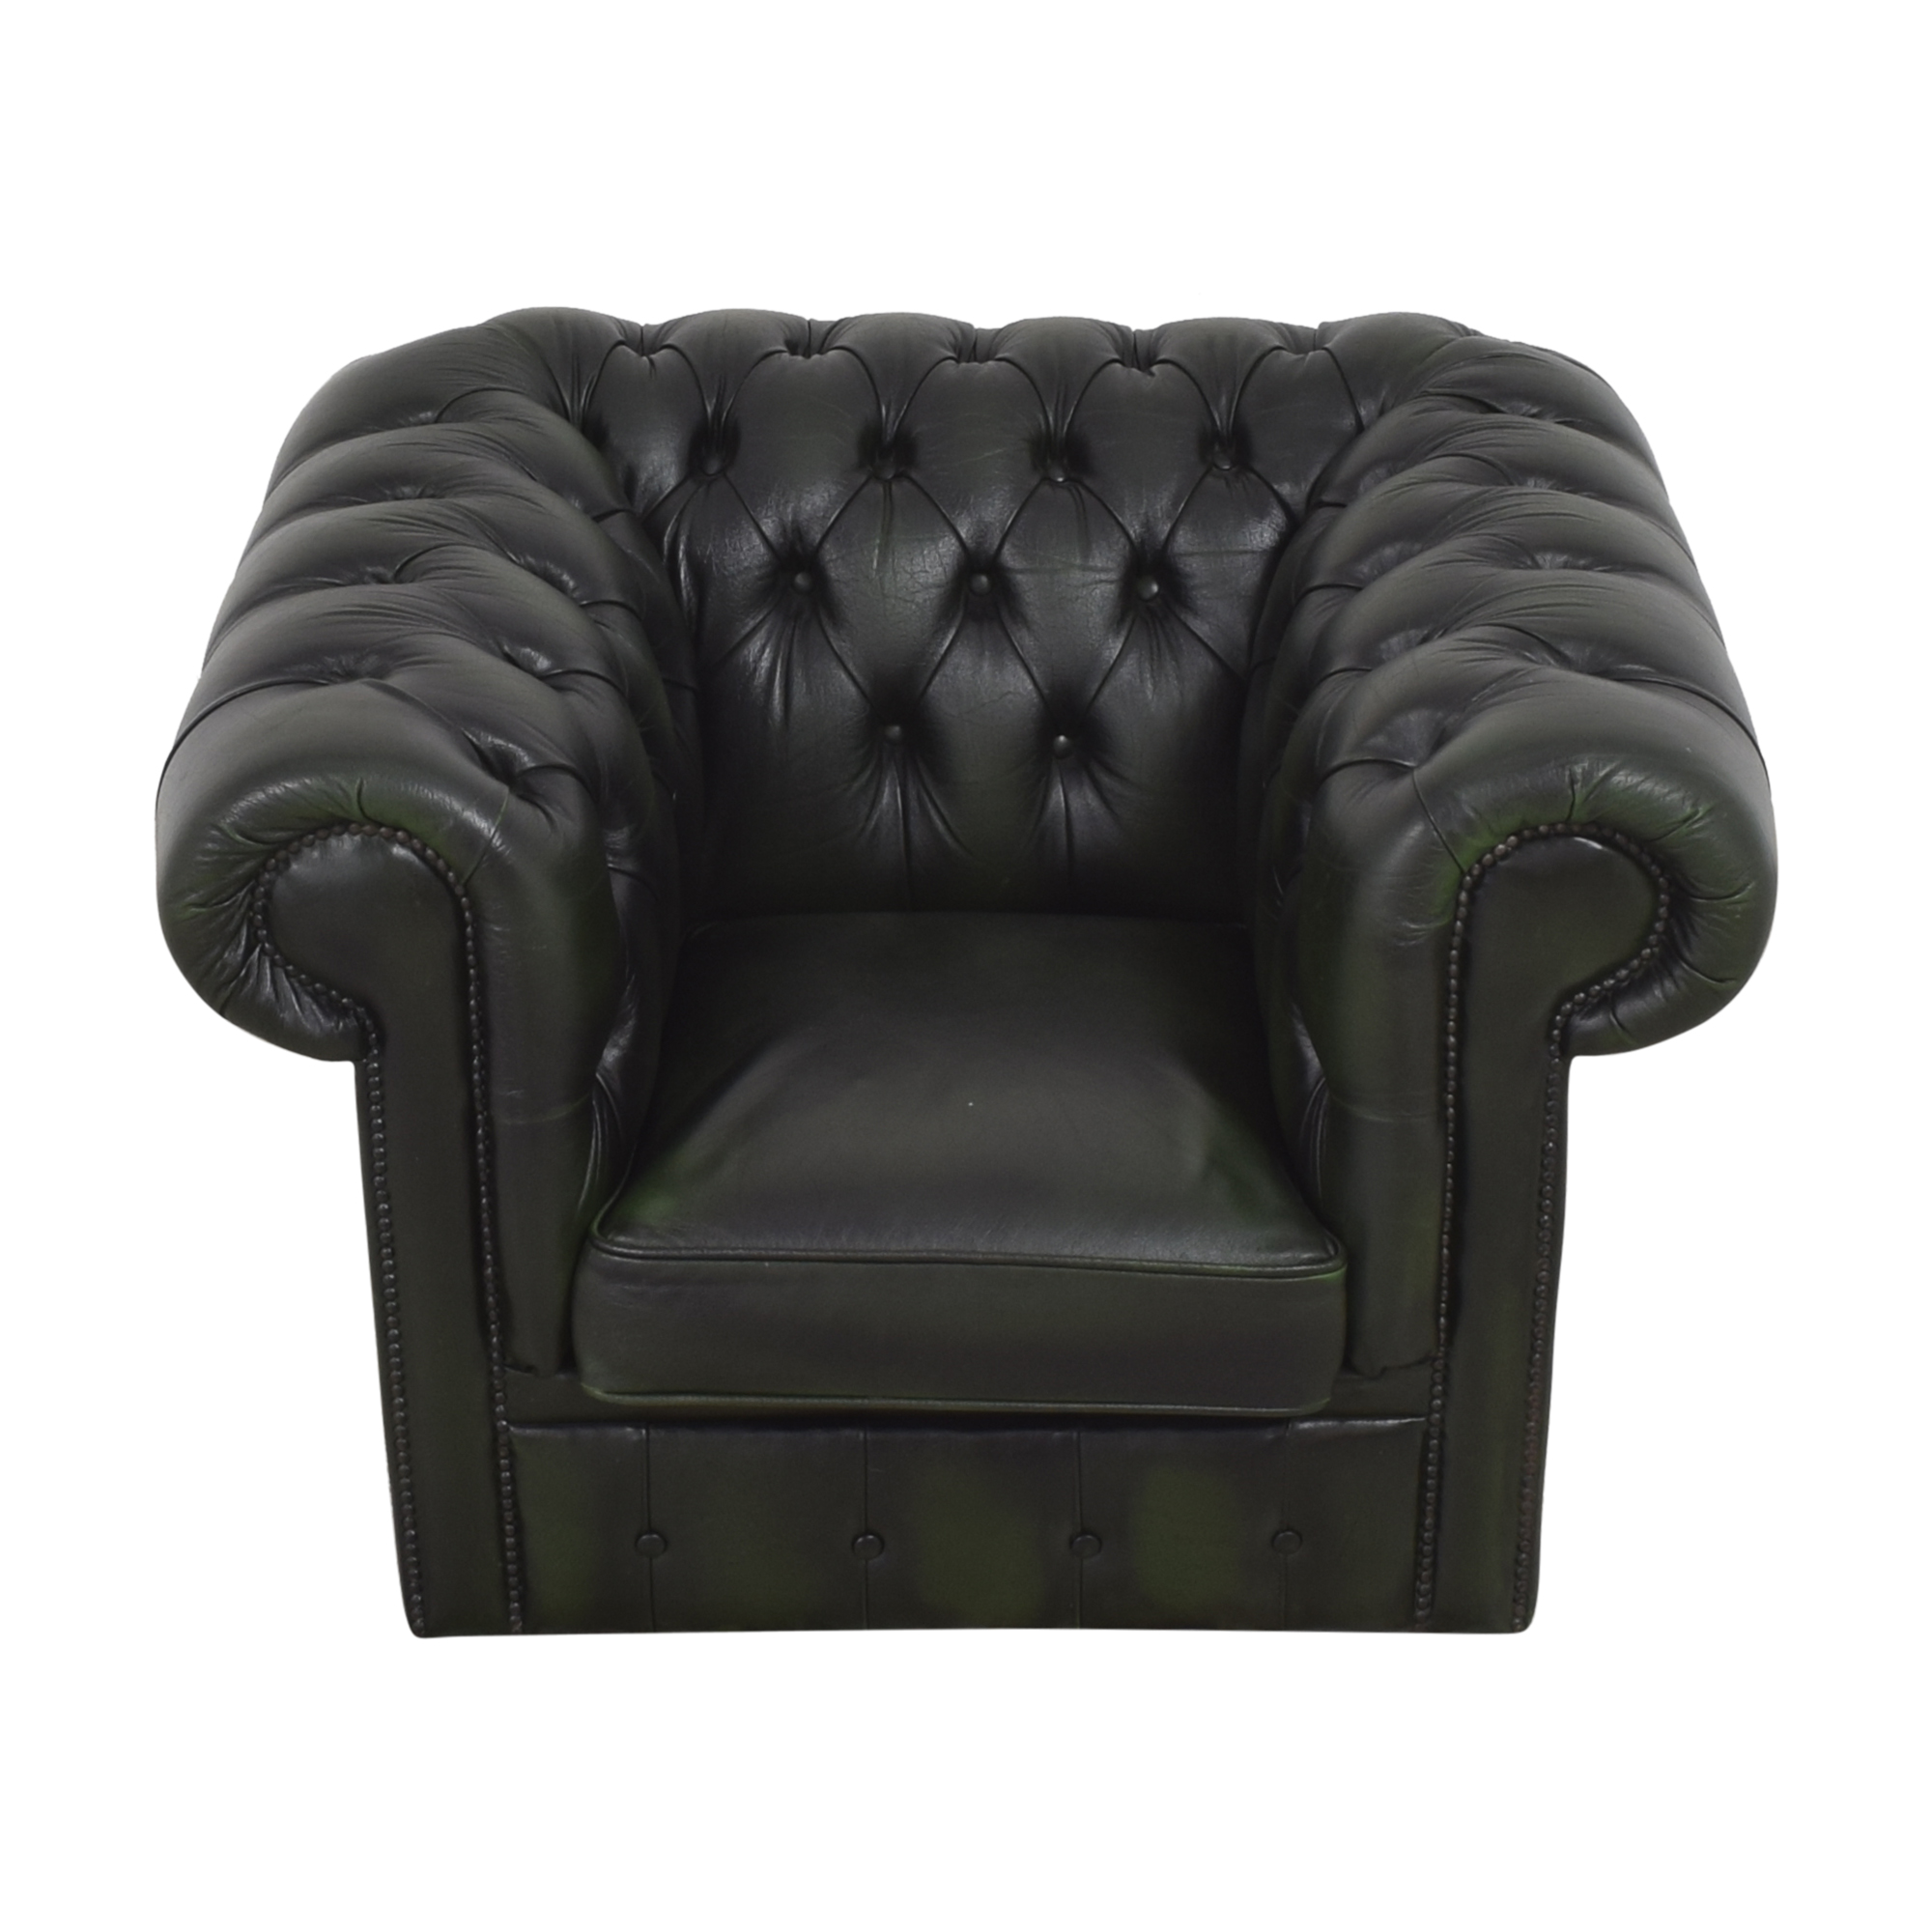 Chesterfield.com Chesterfield Brighton Chair